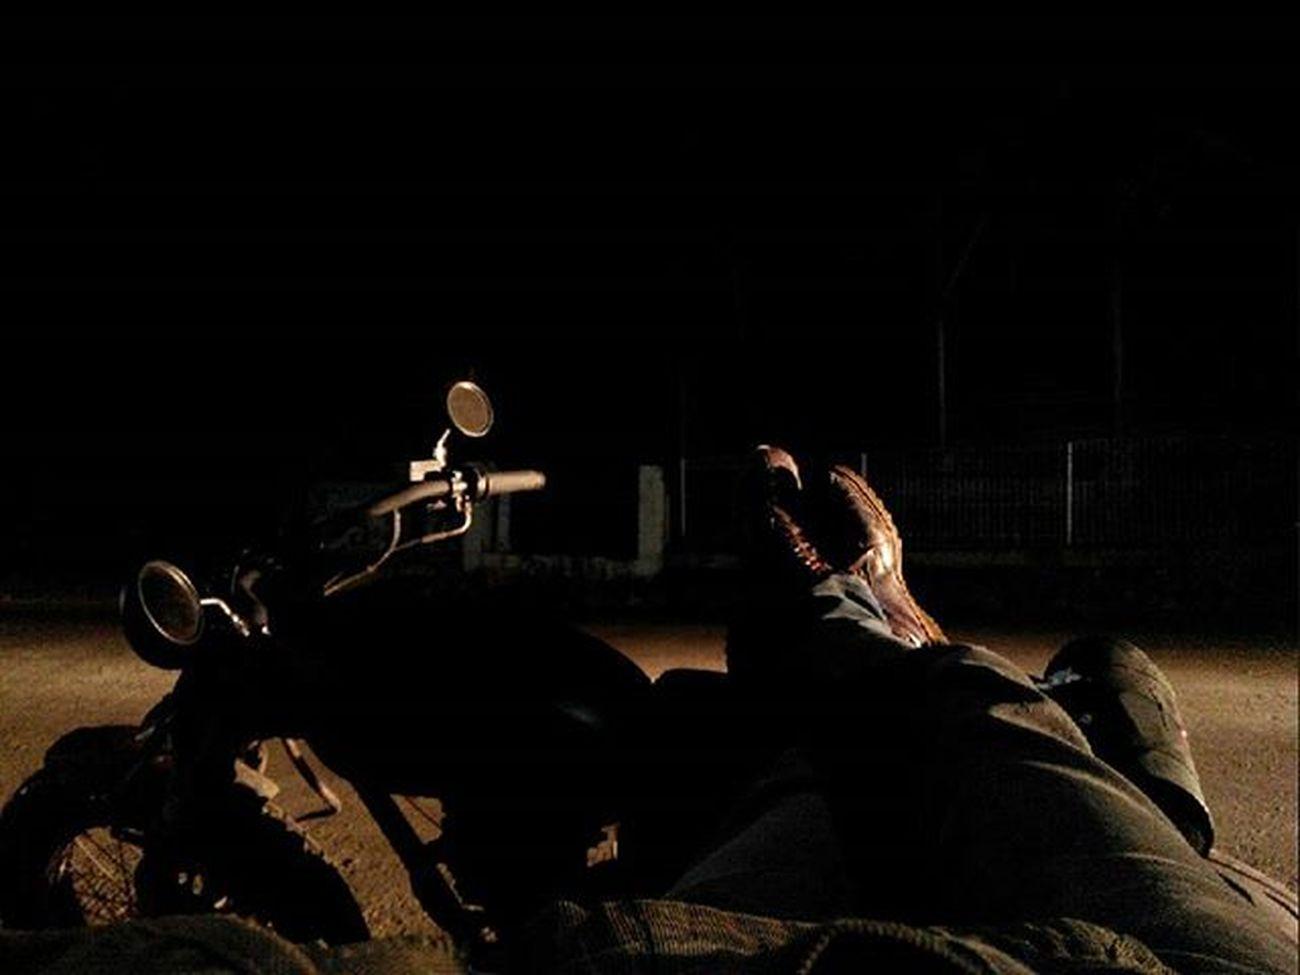 cerita hari ini : sekitar 30menit yang lalu akhirnya parkir dengan kondisi : - paking head depan + samping jebol - oli entah nyisa brp tetes - kampas kopling tipis - baut shock depan kanan entah kemana - bensin tipis, cuman bisa buat kumur - duit modal 2lembar, sisa 3 keping - sepatu kanan kiri penuh oli - jaket + penuh pasir ga jelas - tas beserta isinya dan seluruh kain yang nempel dibadan basah - rokok abis - kopi sachet nyisa 2 (lumayan msh bisa ngopi) - hp akhirnya nyala normal - charger eror - bapak kost nagih - perut lapar - badan masih utuh - muka gitu gitu aja dan yang paling penting adalah BAHAGIAAA !!! dengan segala jenis cerita yang hampir ga masuk akal. Udahgituaja Linggarjati Kuninganjabar keren abisss !!! Bukancurhat Pengenpameraja Maklum Touringpemula Jarangjarang Yangpentingbahagia Besokmahpedulisetan sampai nanti...bila diperkenankan...🙏 Lenovotography Pocketphotography Nightlight Classicbike CB100 Silhouette Photostory Lzybstrd